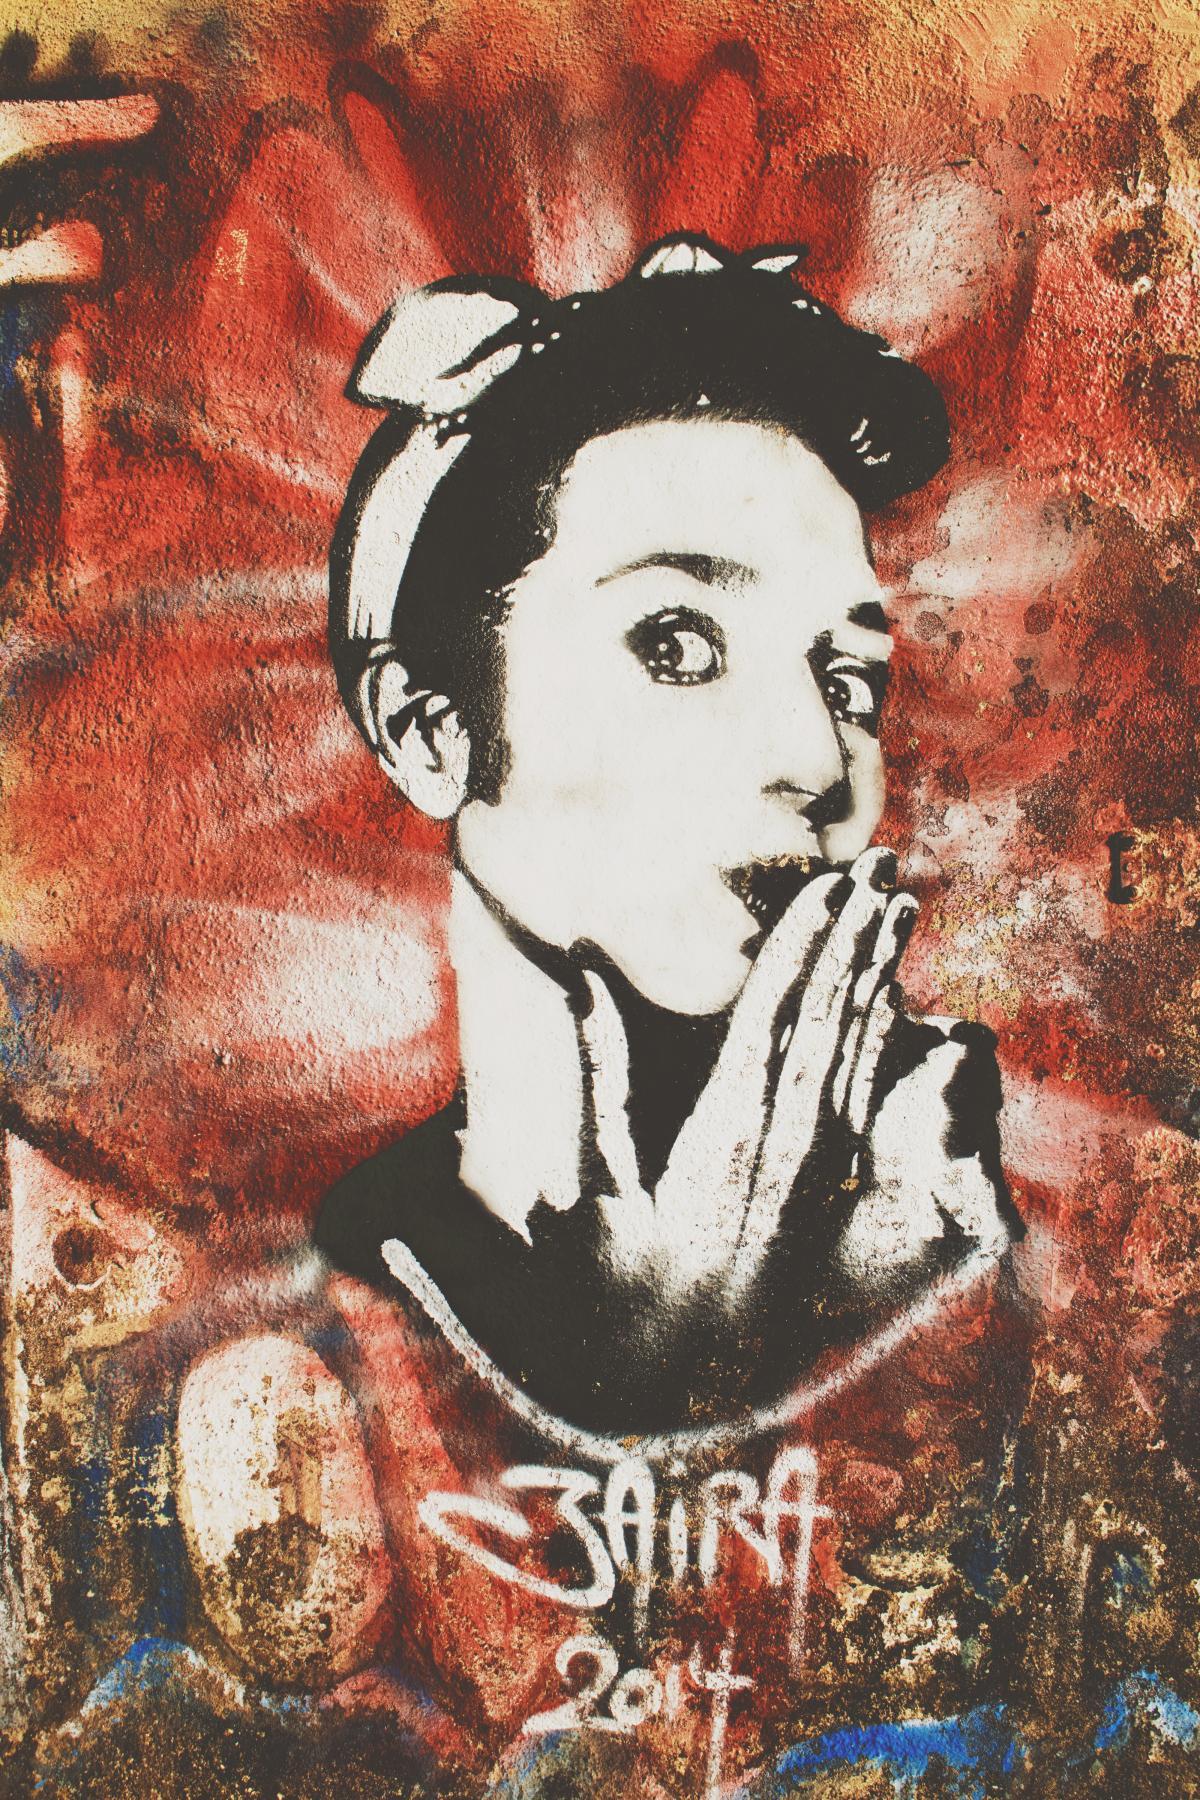 Artwork Graffito Decoration #141391